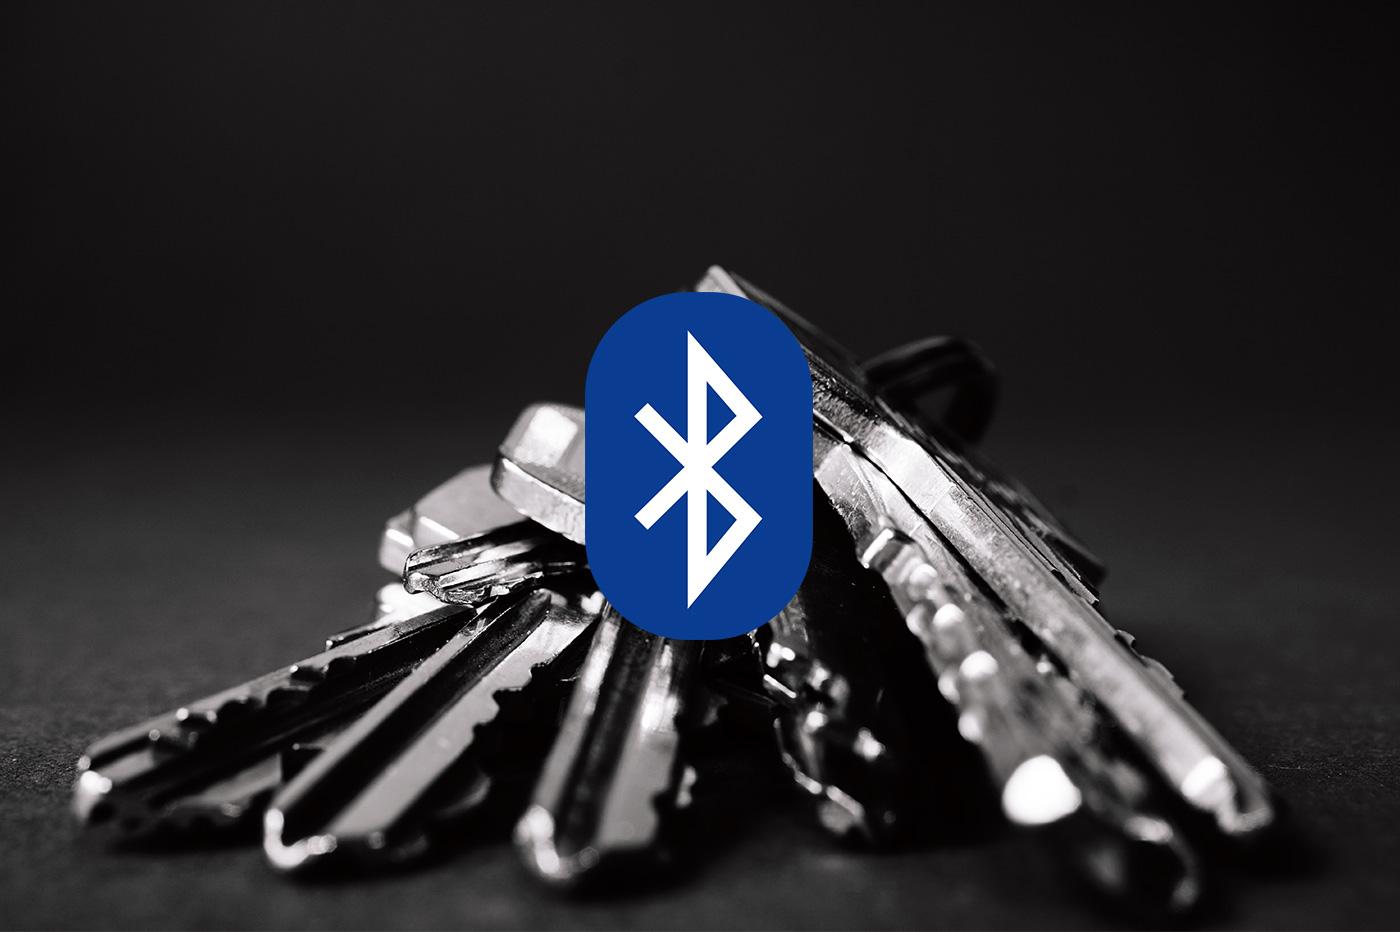 Bluetooth faille